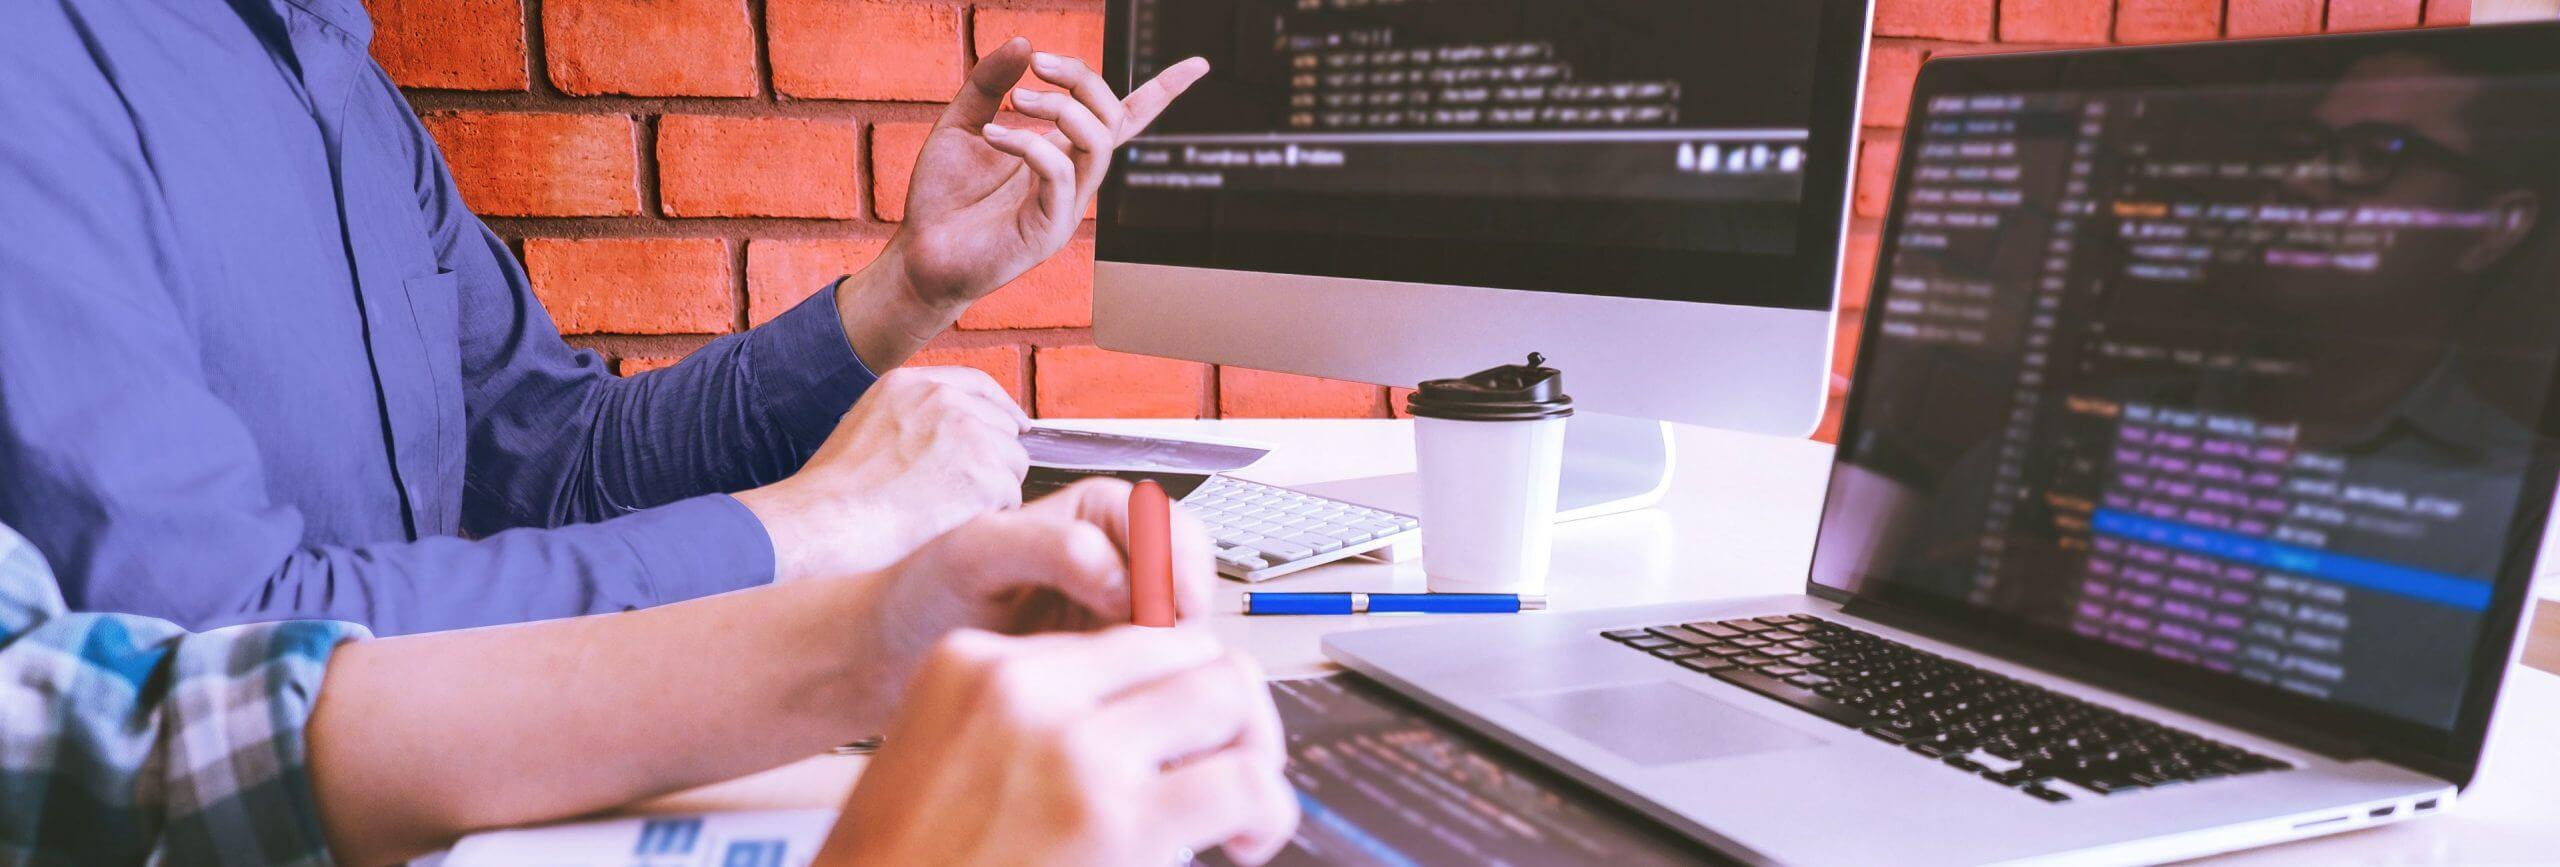 Web Applications Development Trends 2020